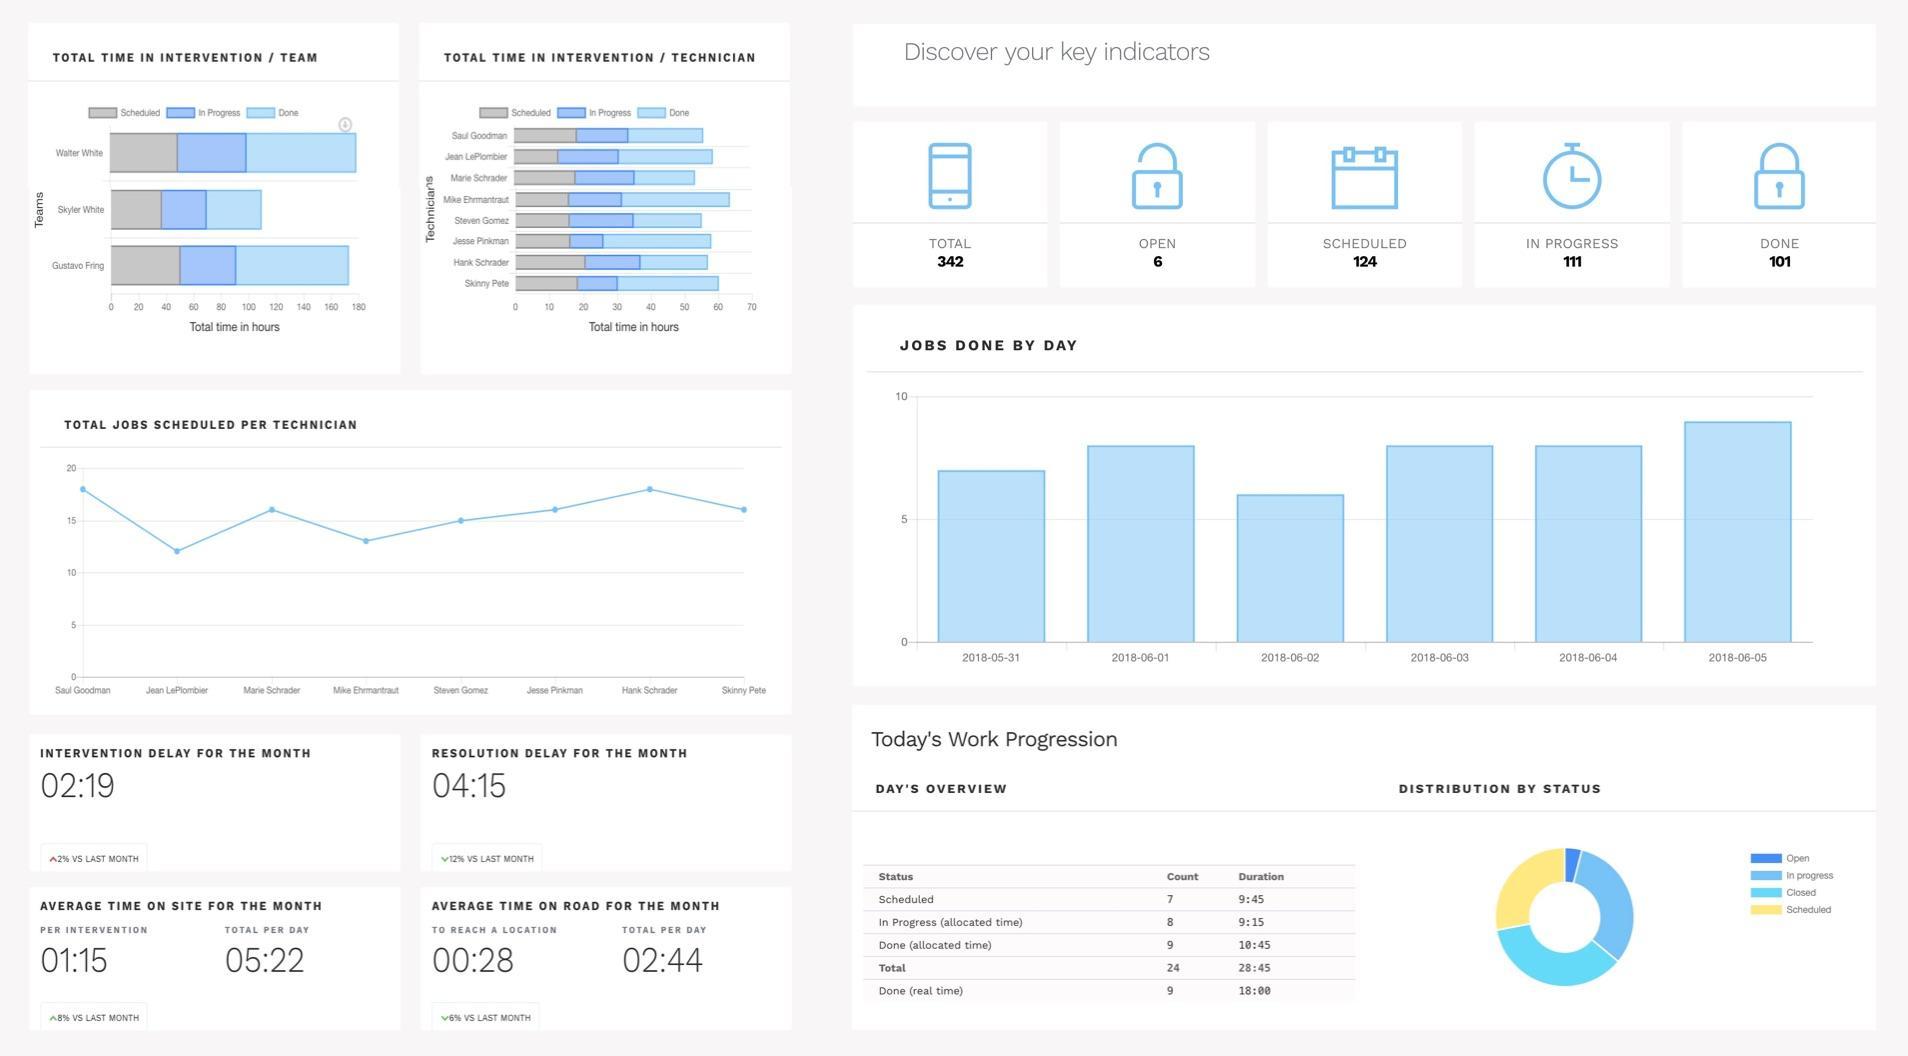 Statistiques et indicateurs clés (KPI) de mesure de la performance